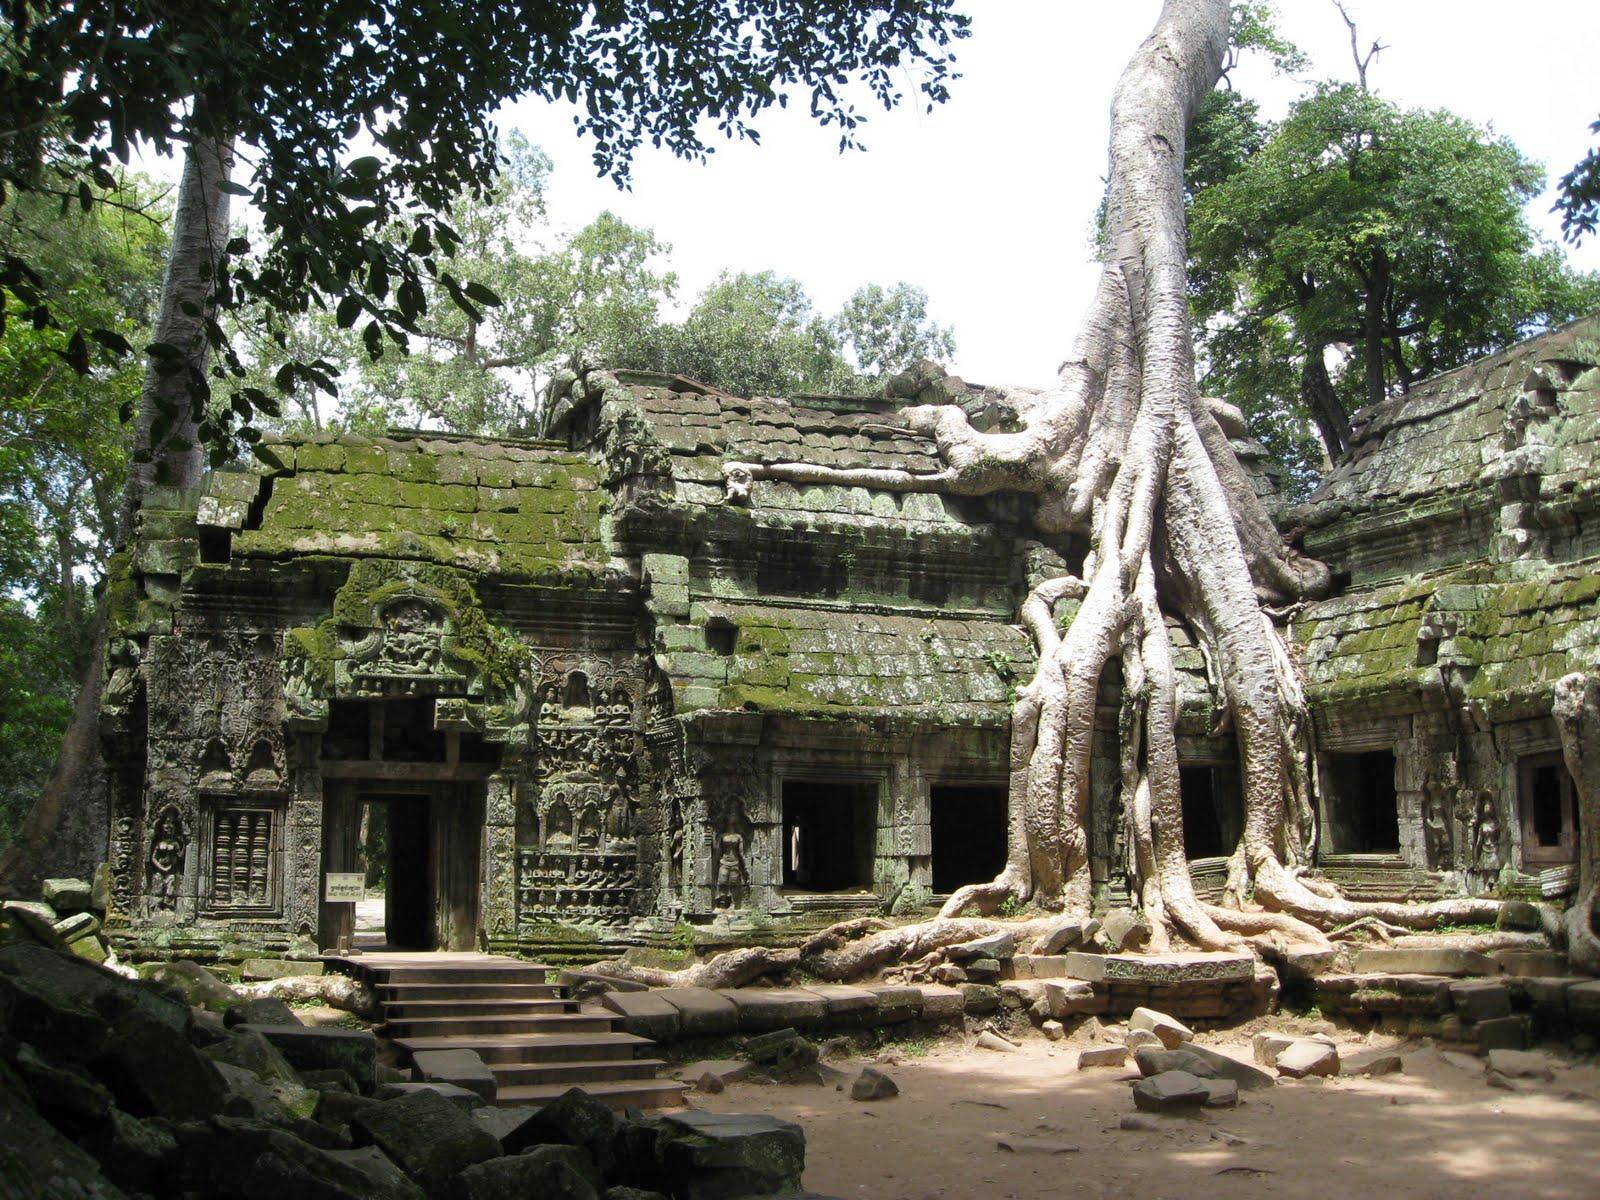 angkor-wat-background-14-724332.jpg